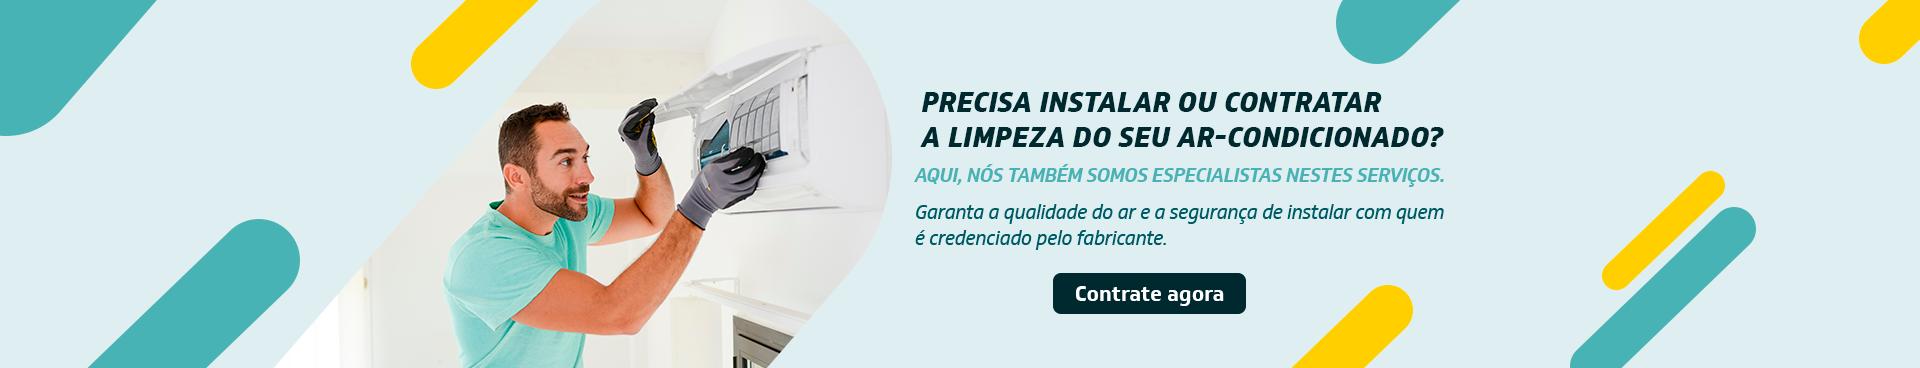 fbd-instalacao-e-limpeza